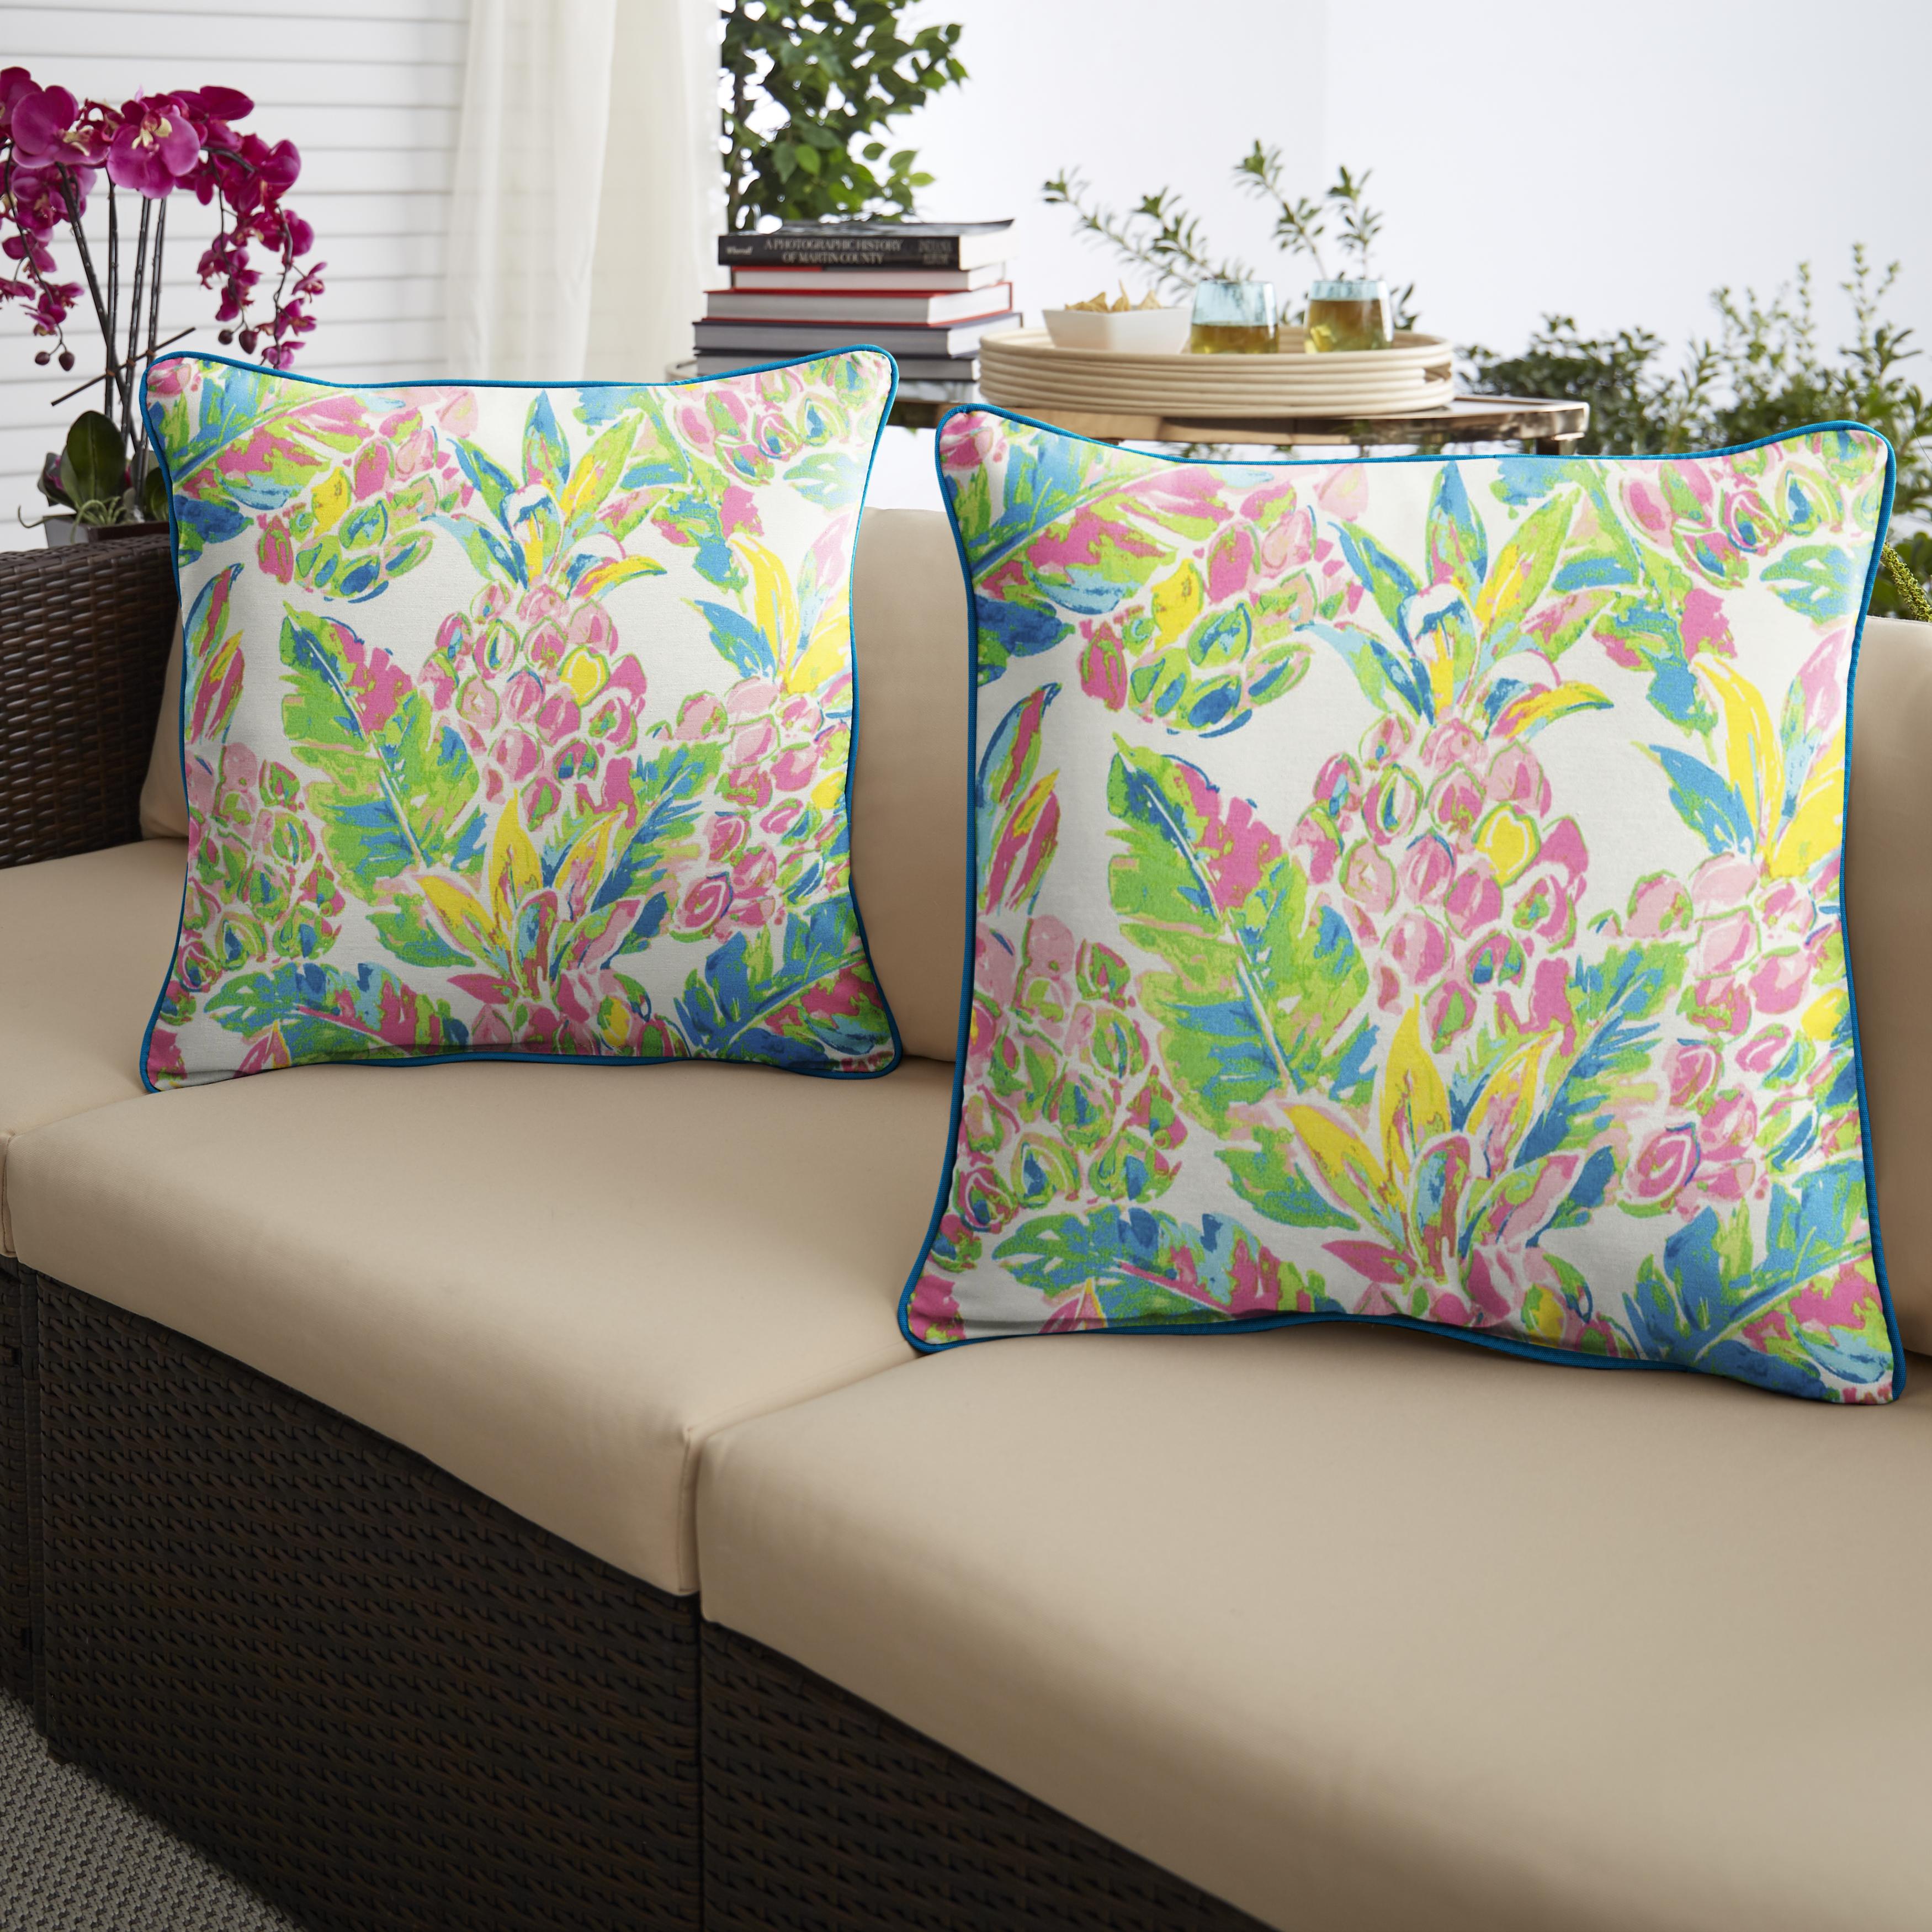 Pink/Blue Set of 2 Outdoor Pillows